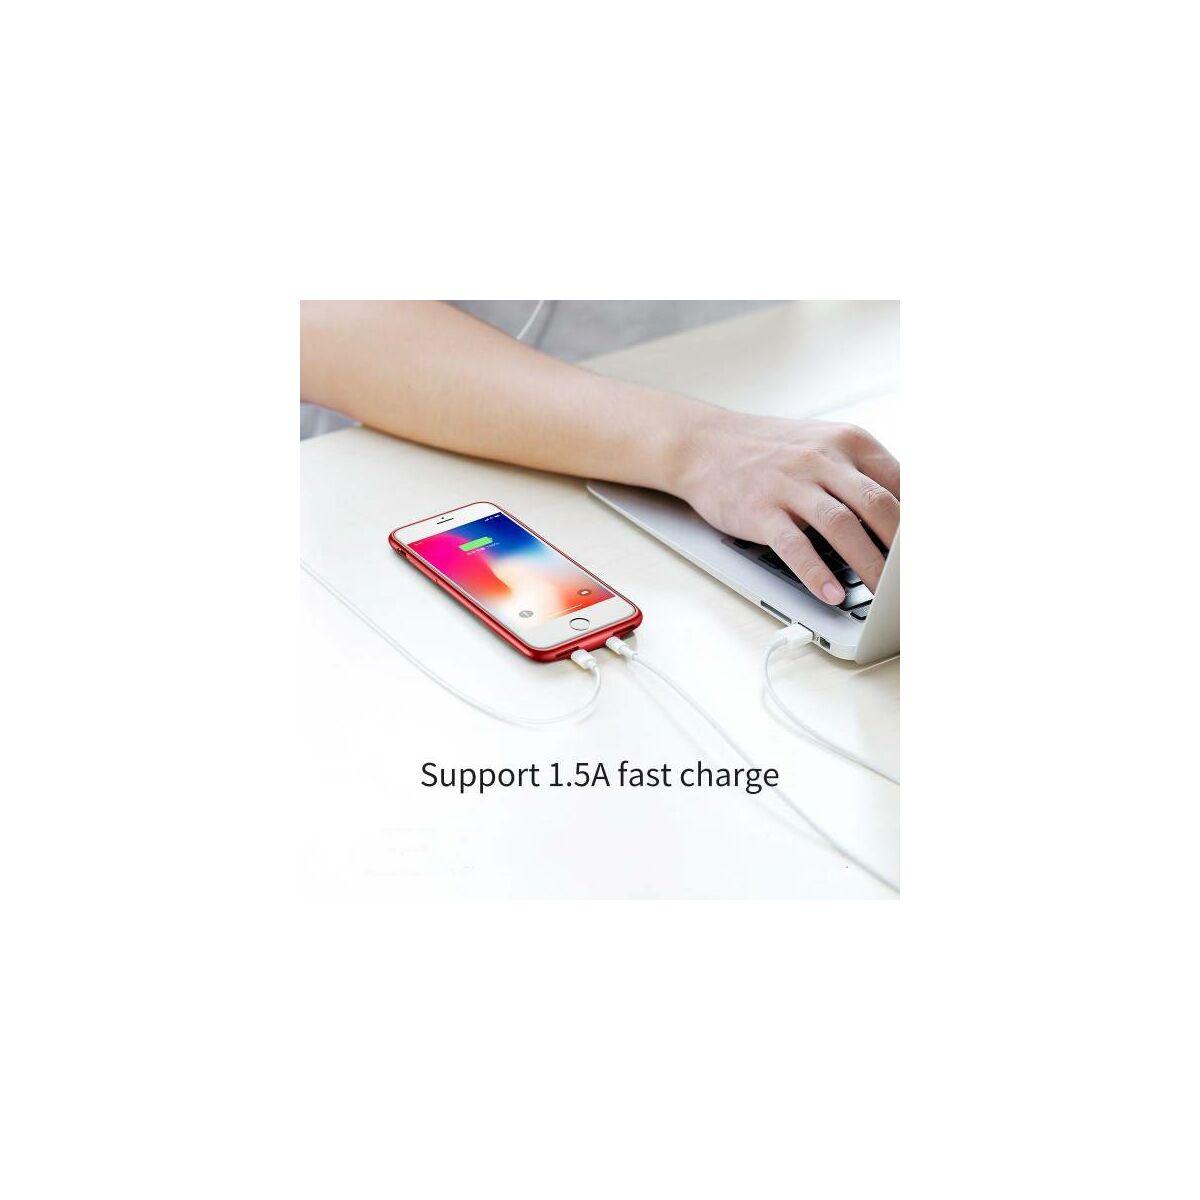 Baseus iPhone 8/7 Plus Audio tok, piros (WIAPIPH8P-VI09)